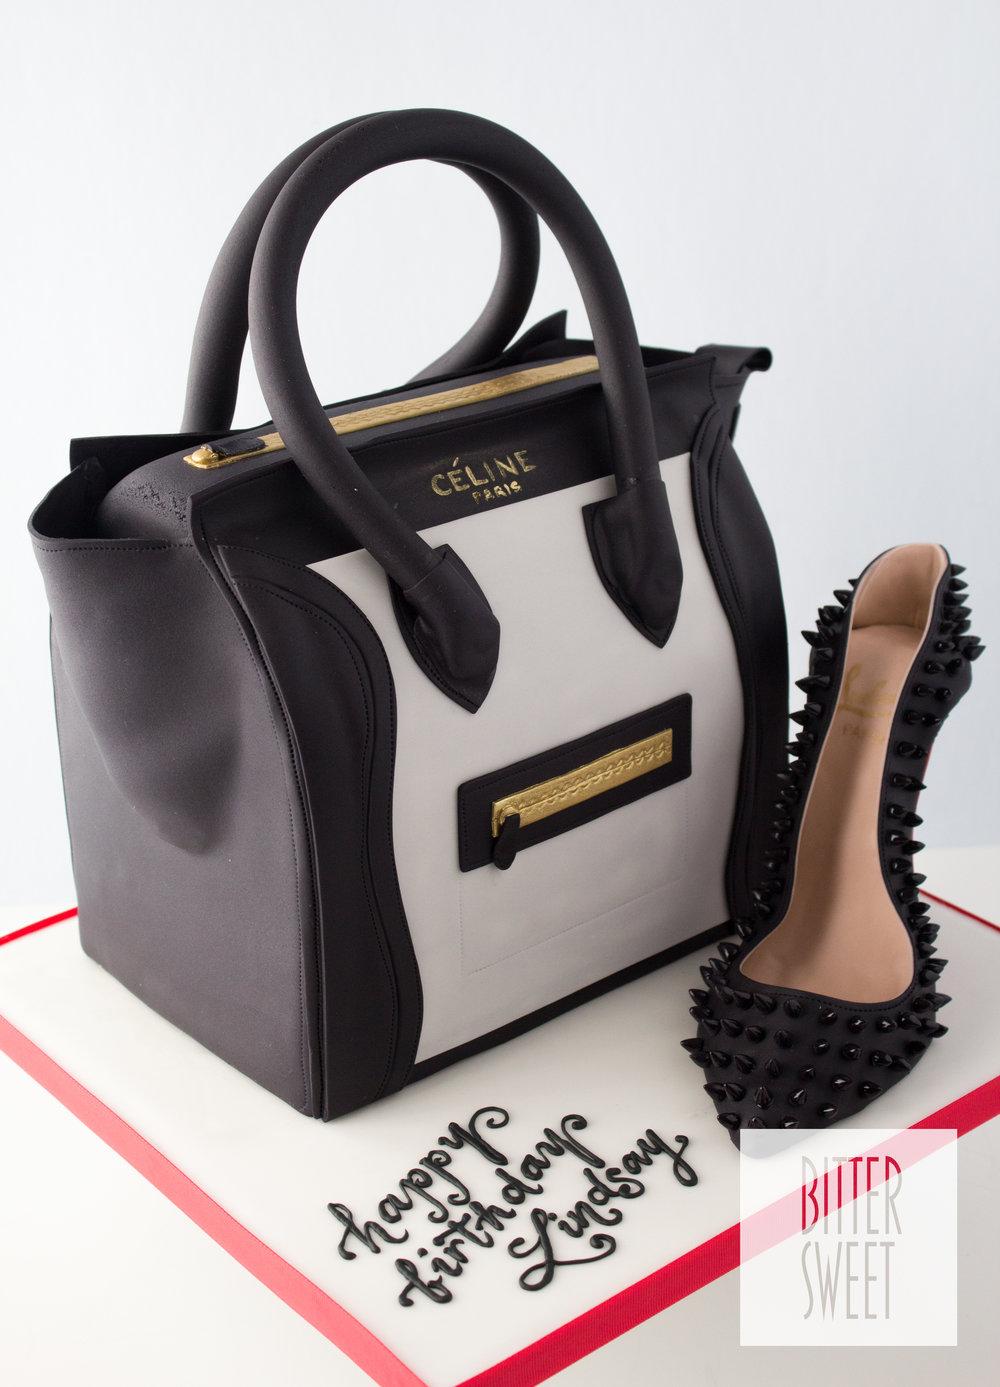 Bittersweet_Birthday_Celine Handbag.jpg